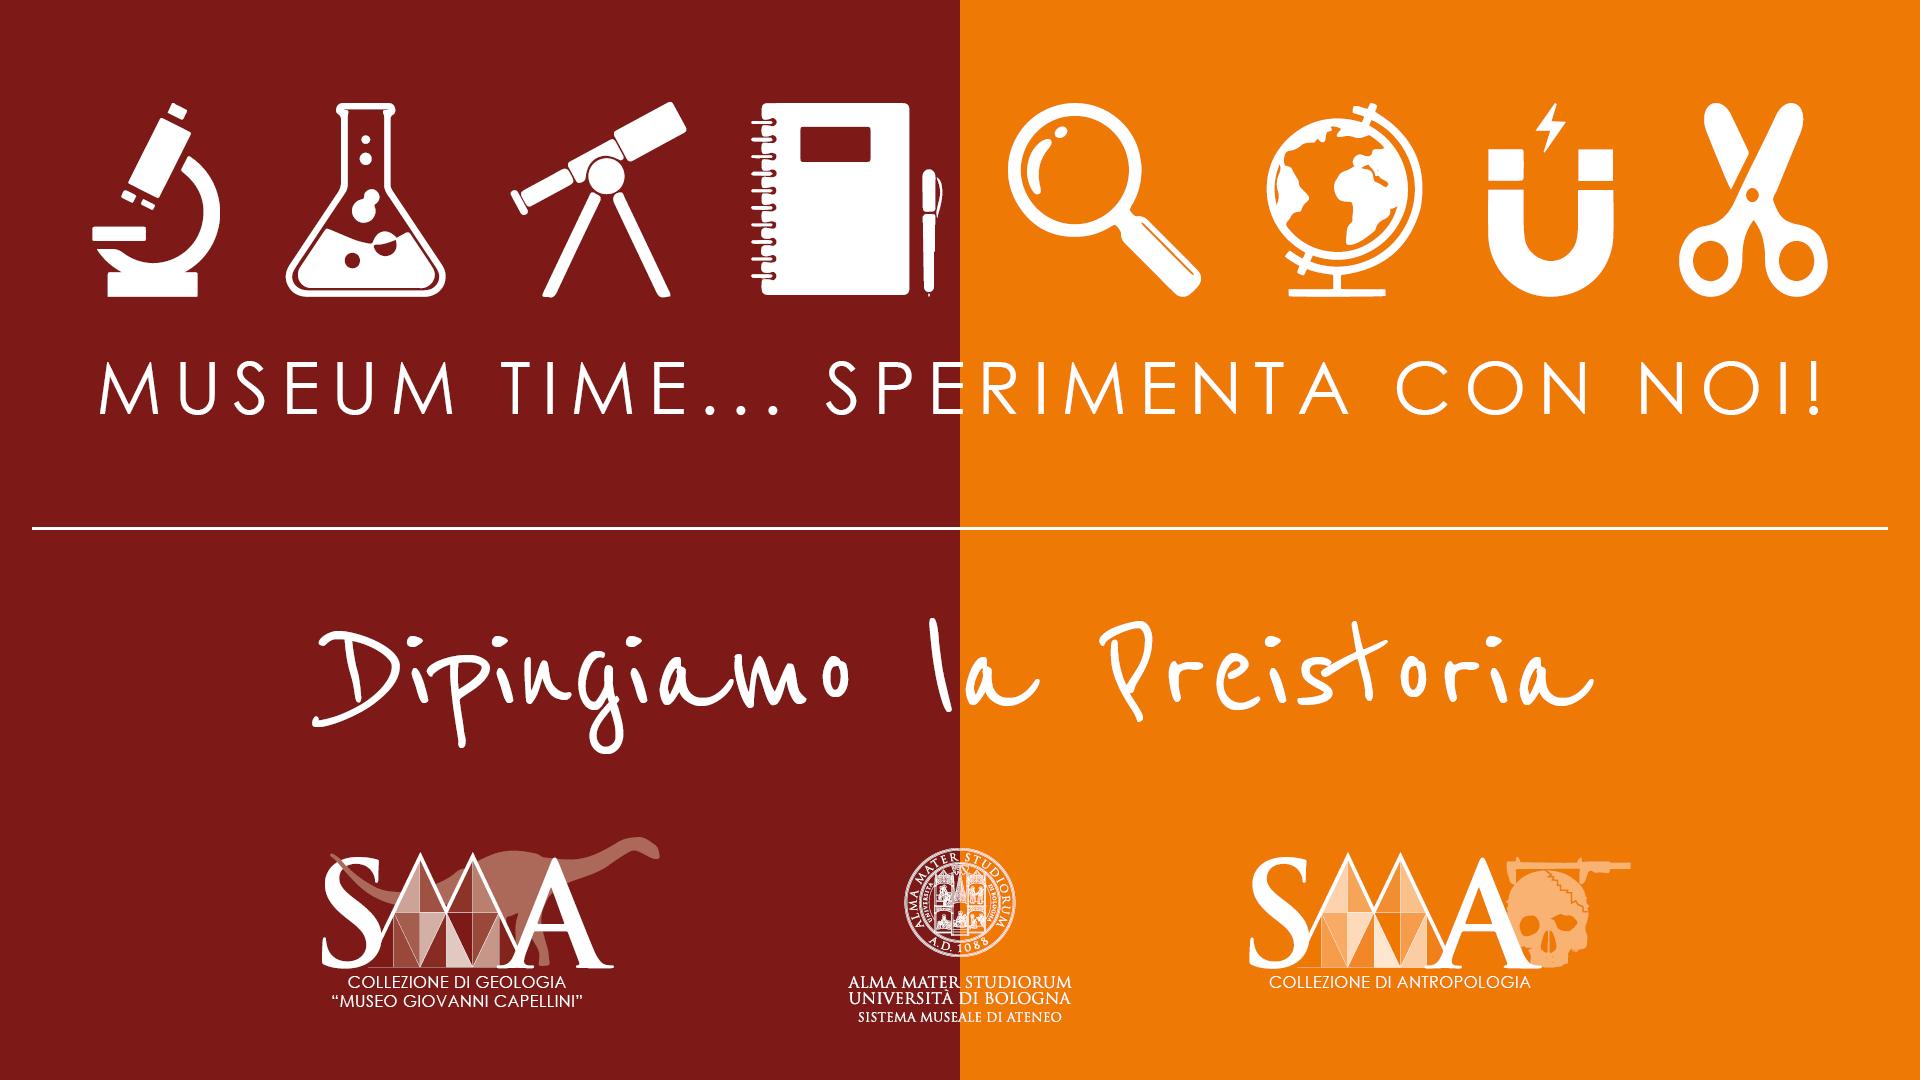 http://www.icom-italia.org/wp-content/uploads/wpforms/10320-faf7ed92f83be88bc622f726ed042c0c/dipingiamo_la_Preistoria-782919fa6e7097ccd6ff95526307b95a.jpg